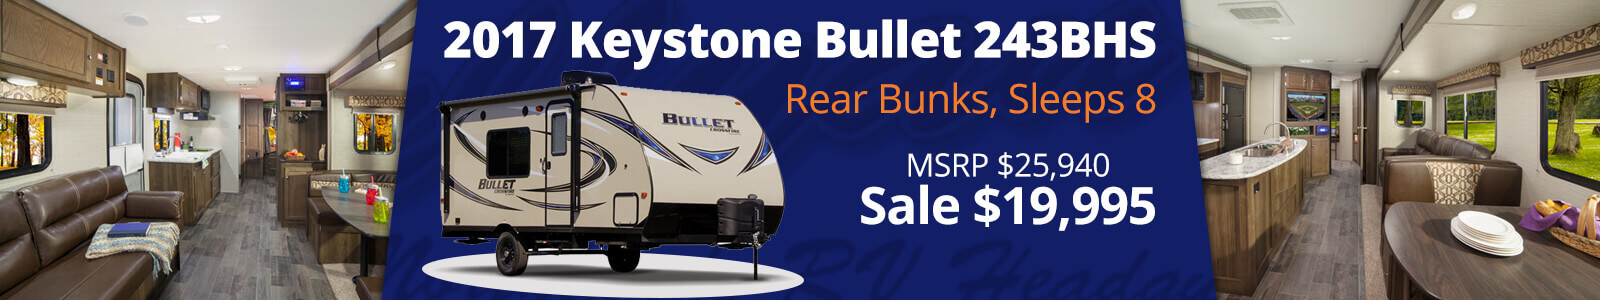 Keystone Bullet